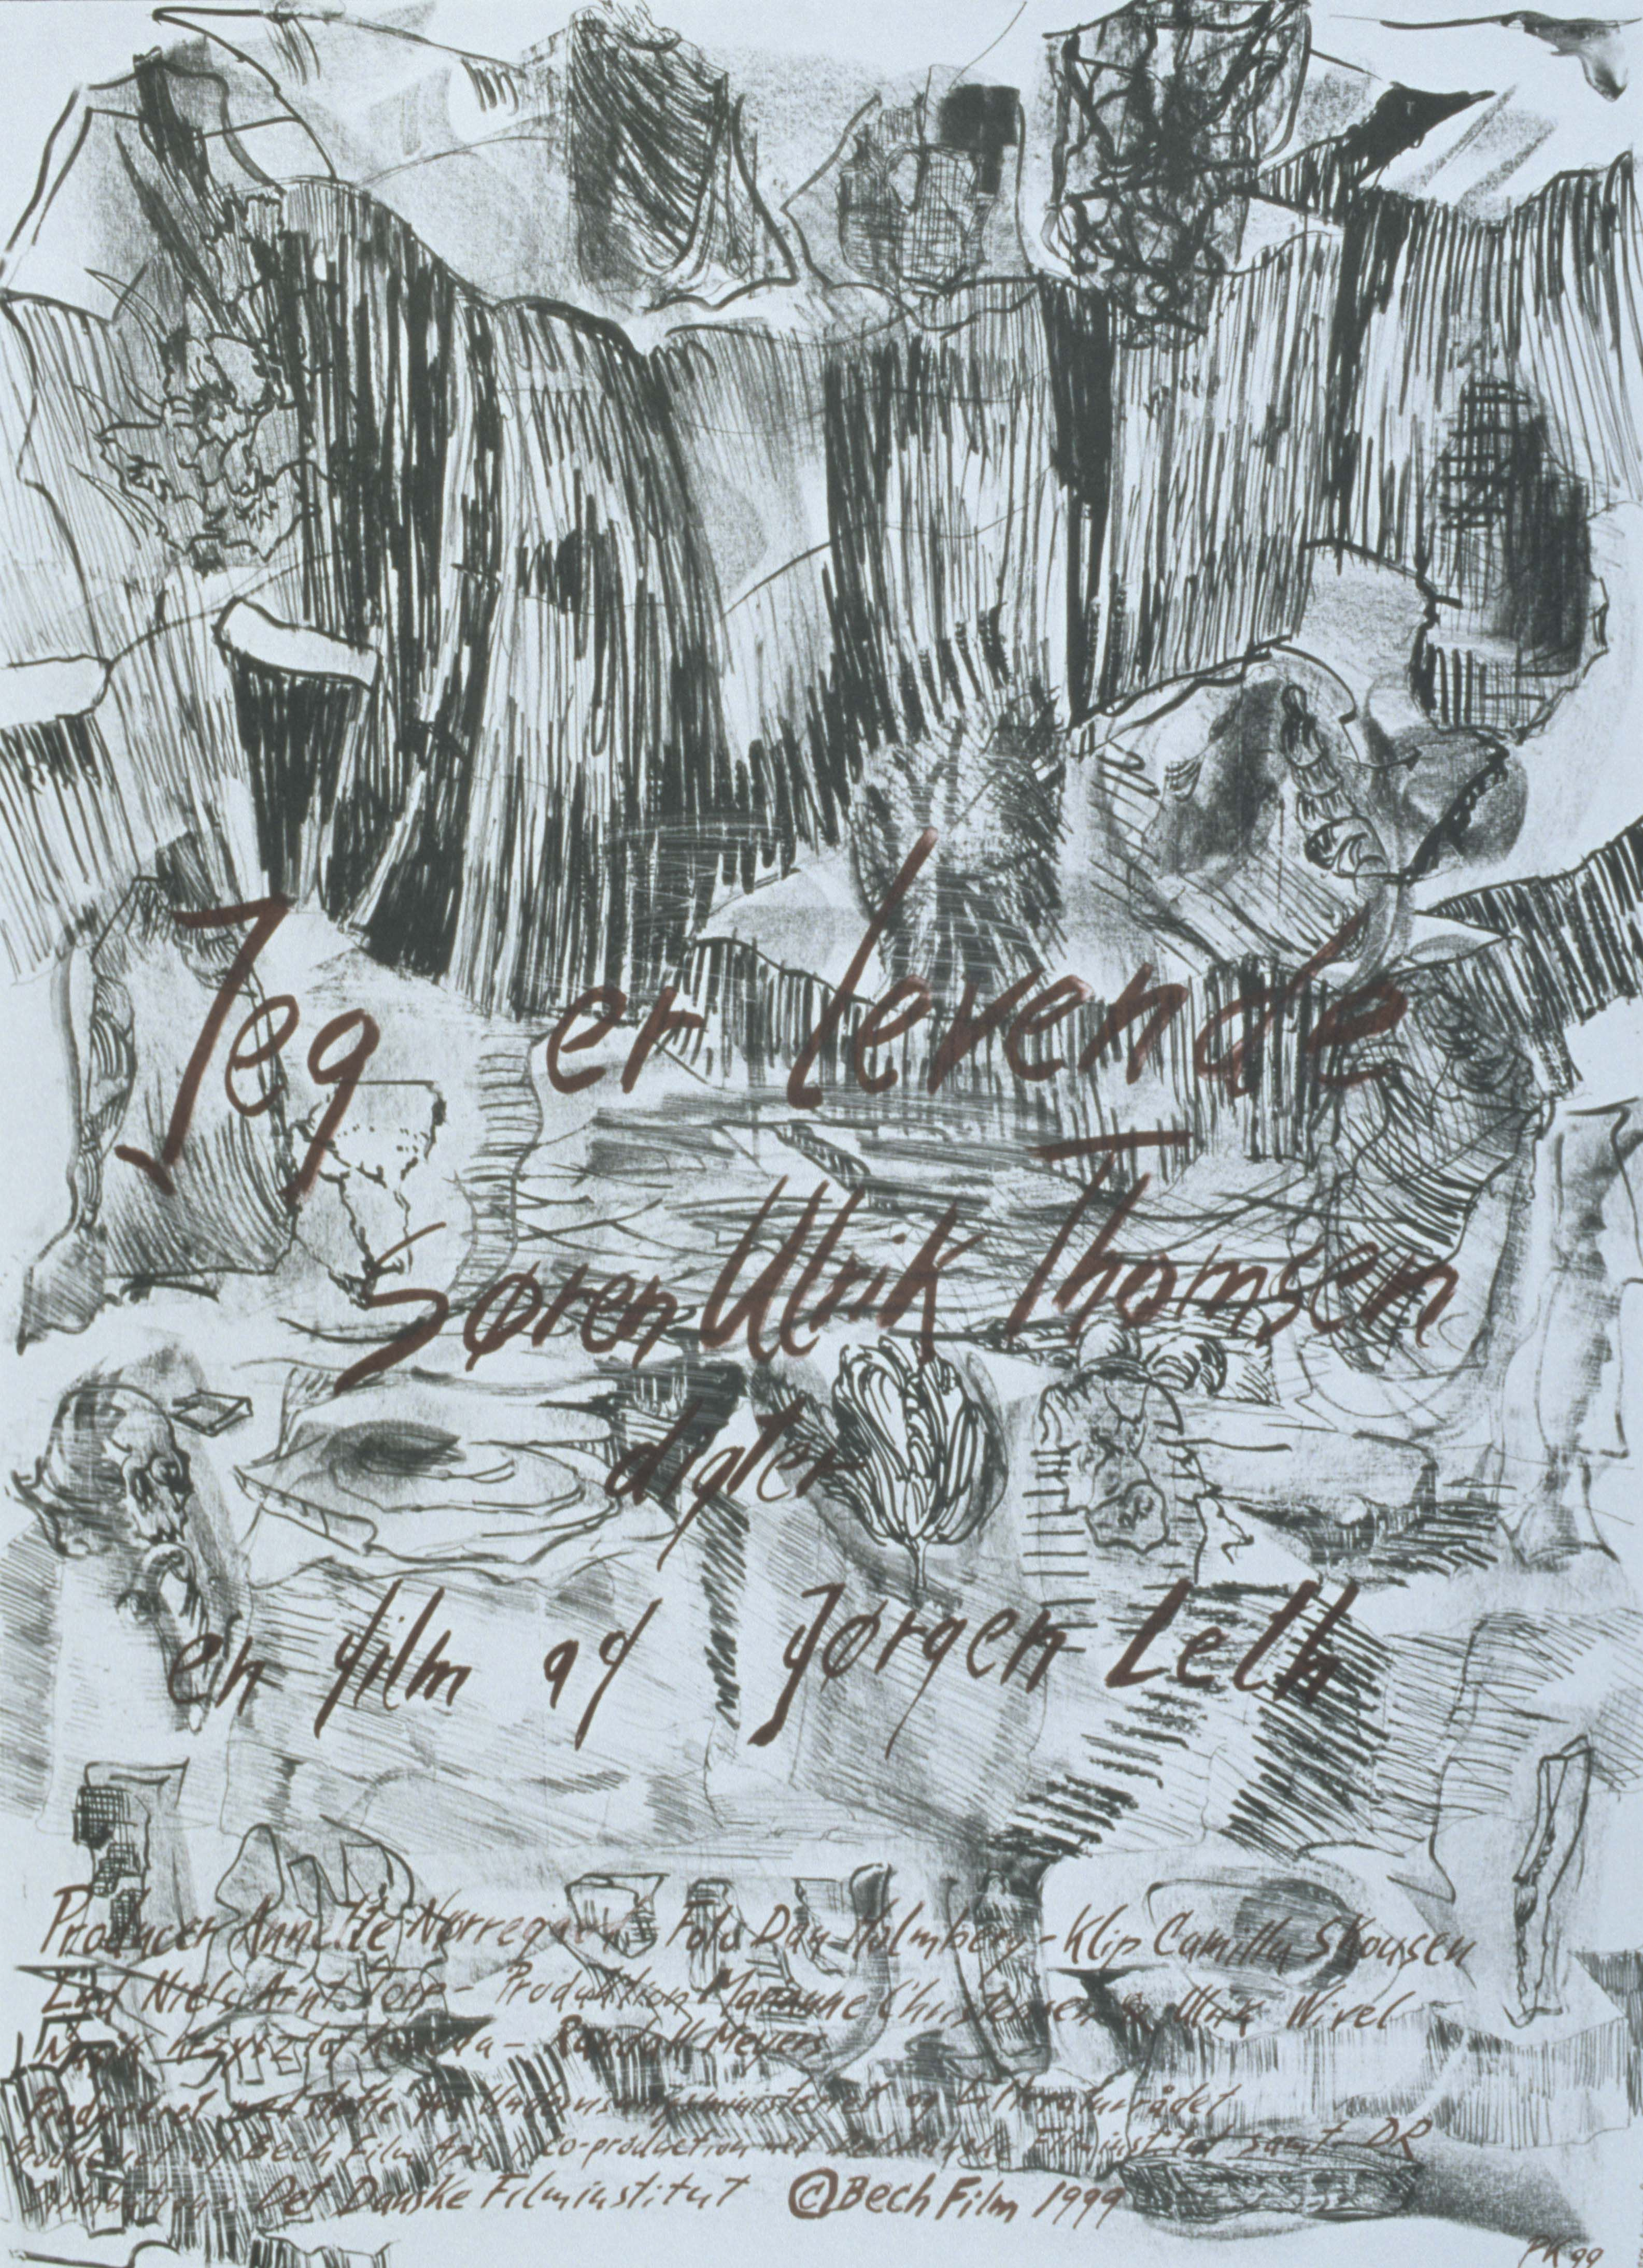 Jeg er levende - Søren Ulrik Thomsen, digter   (Jørgen Leth, DK, 1999) Poster art: unknown. Poster still: unknown. Portrait of the Danish poet Søren Ulrik Thomsen. http://www.dfi.dk/faktaomfilm/film/da/27170.aspx?id=27170